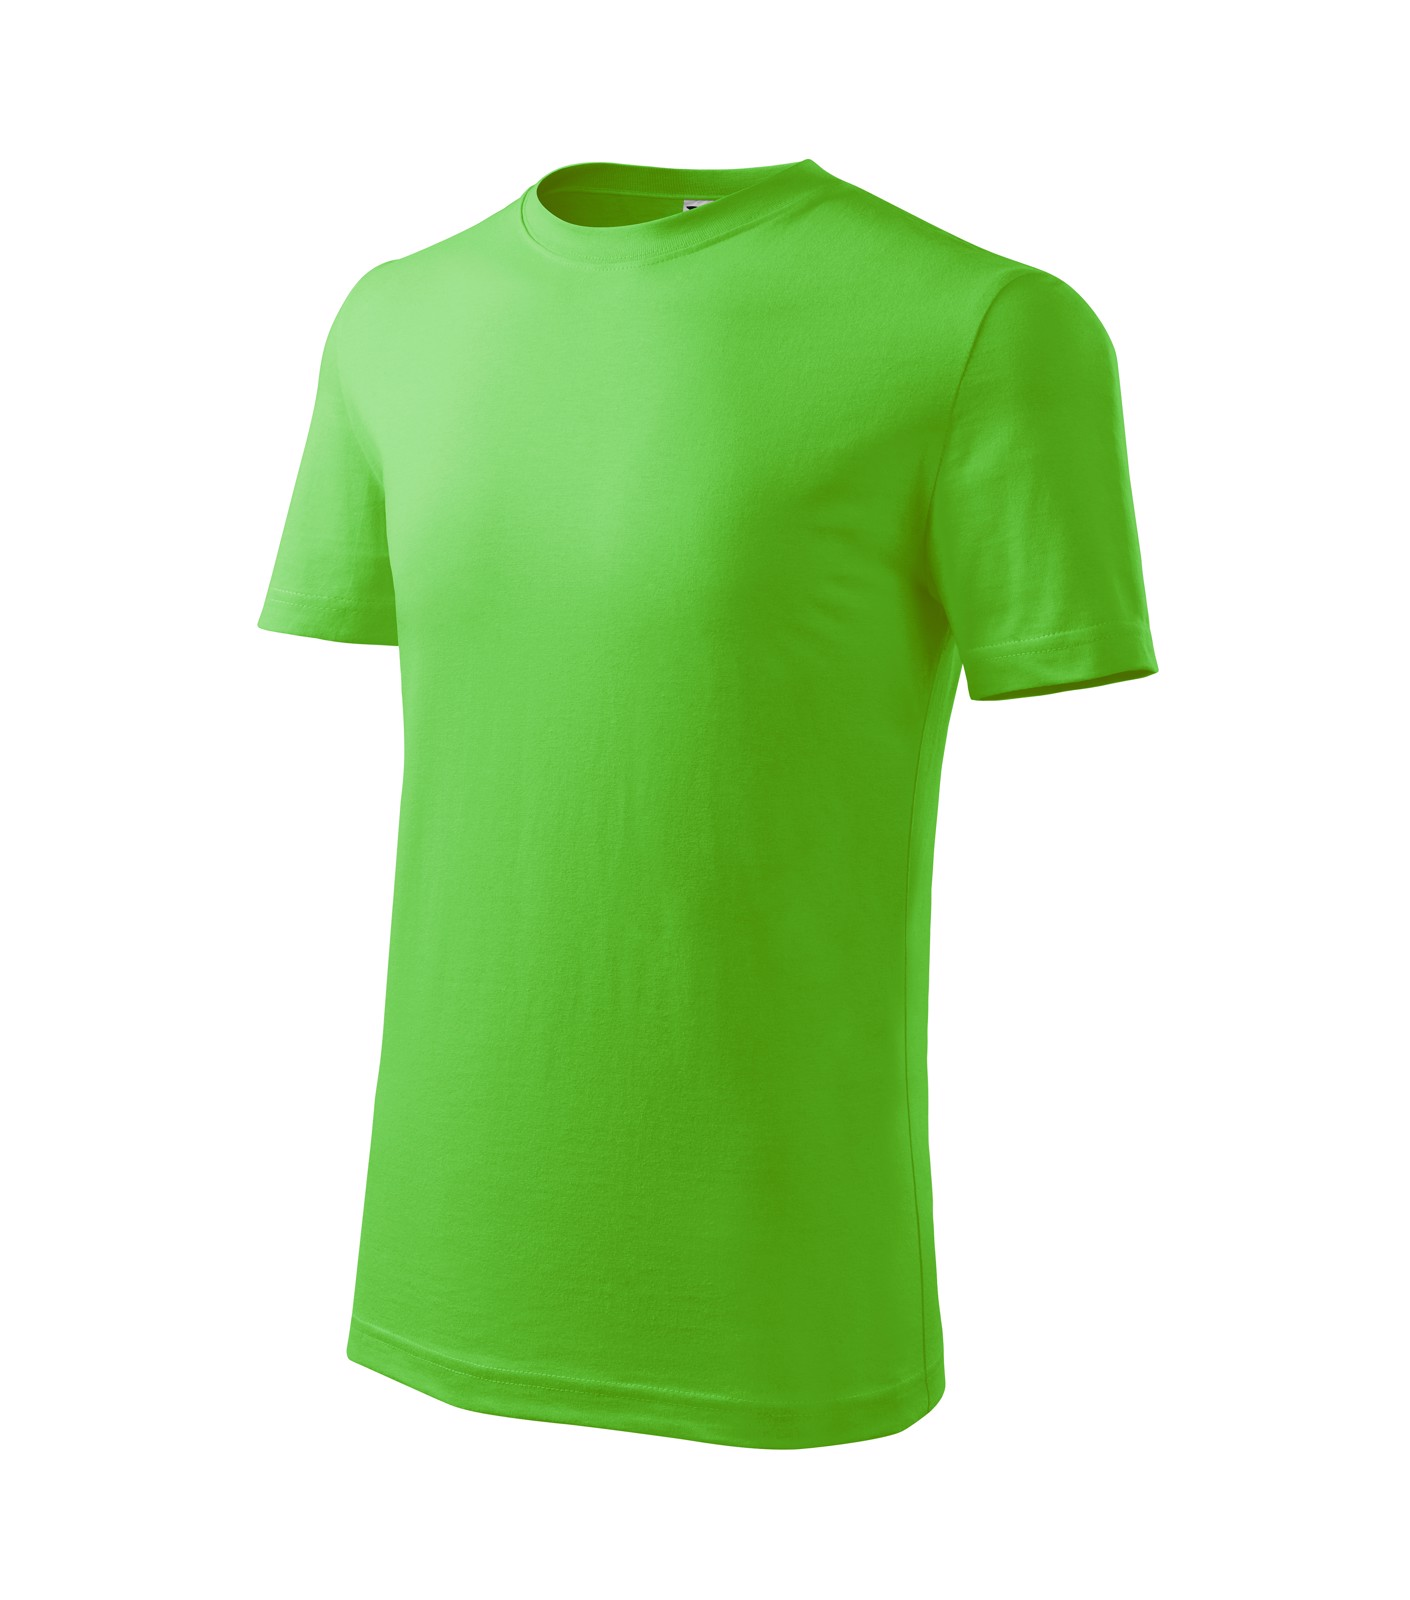 T-shirt Kids Malfini Classic New - Apple Green / 10 years